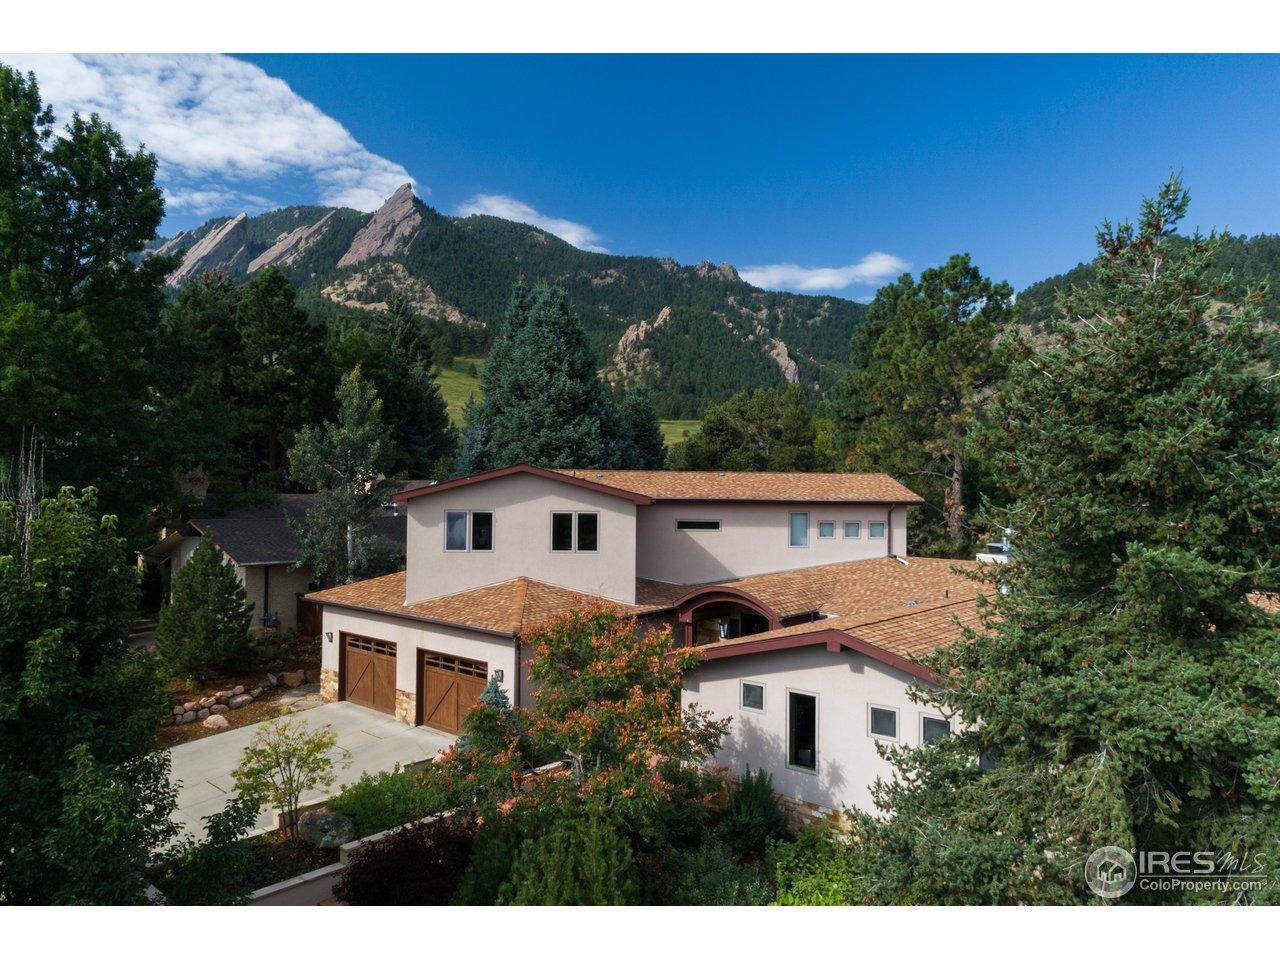 725 7th St, Boulder CO 80302